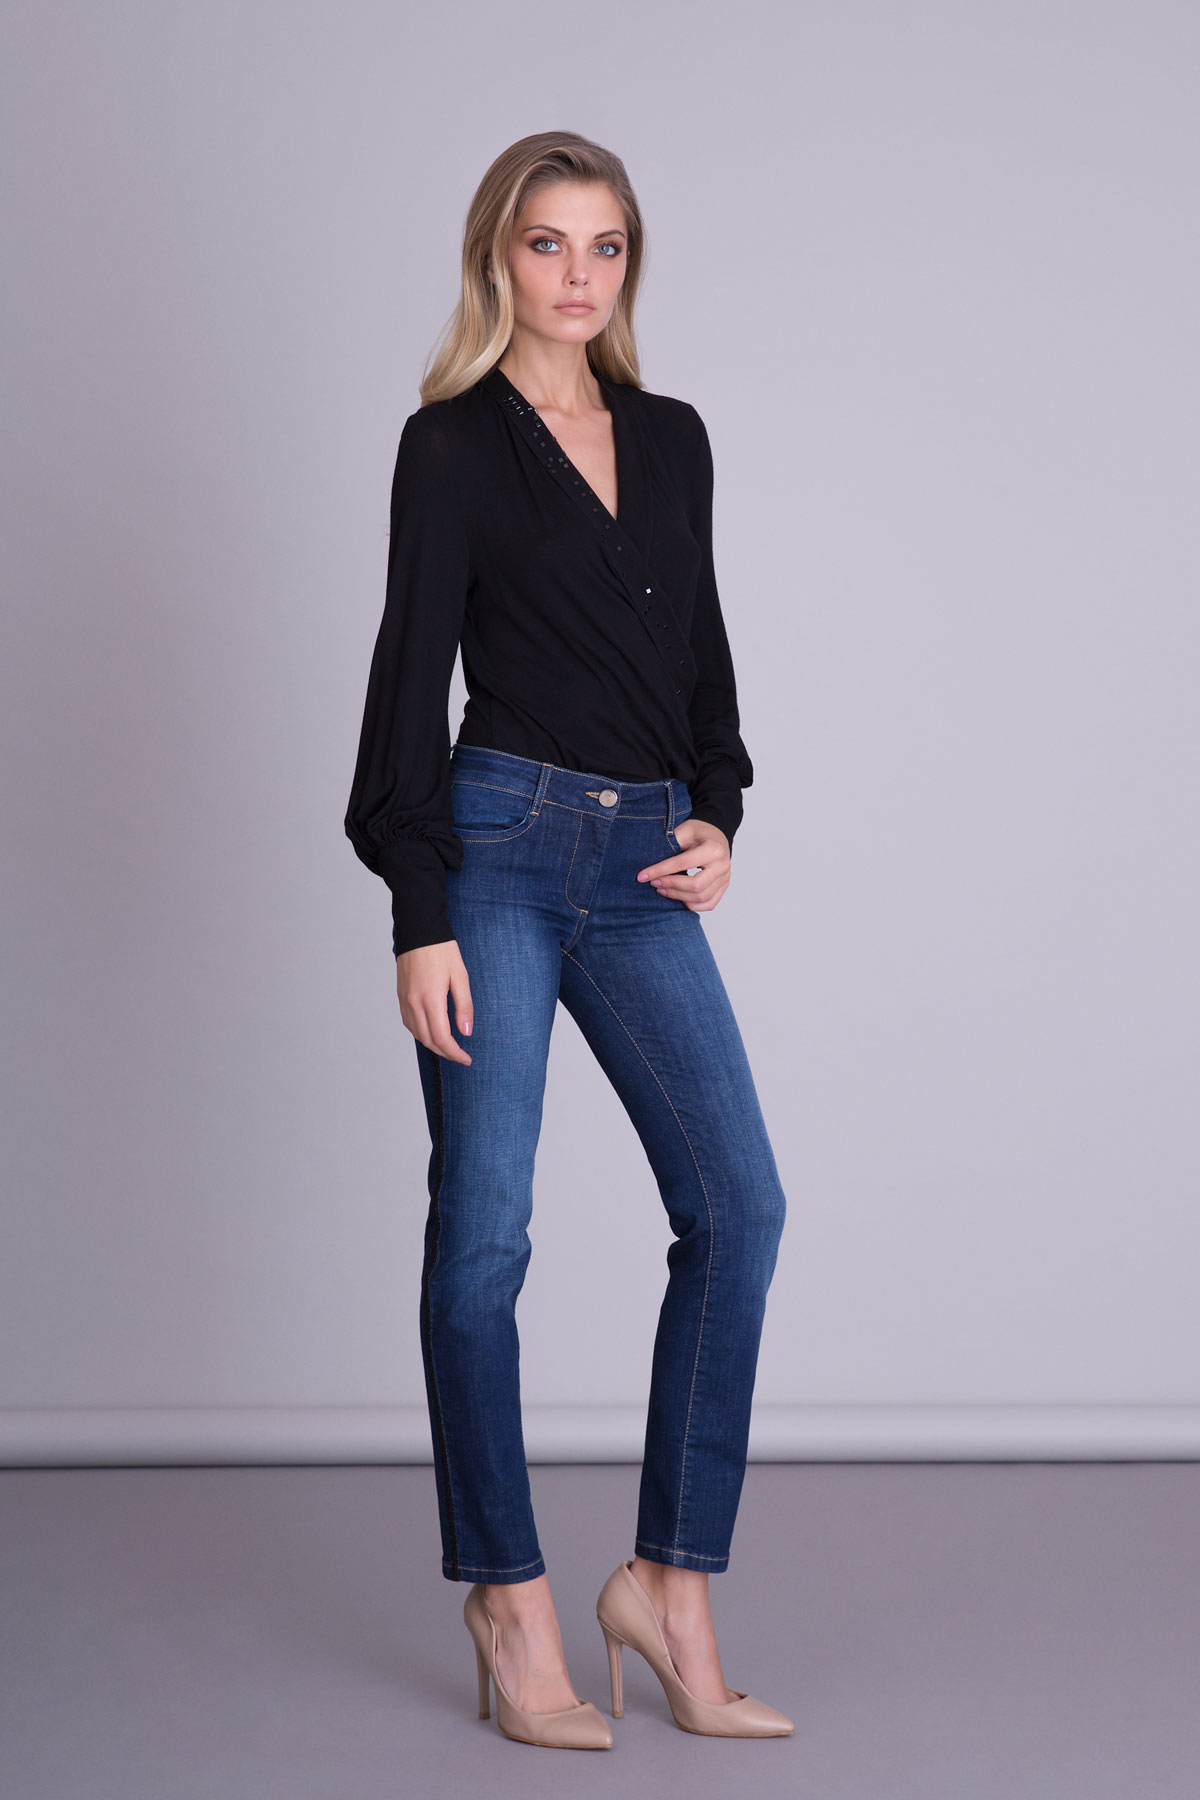 Taş Baskılı Uzun Kollu Siyah Bluz